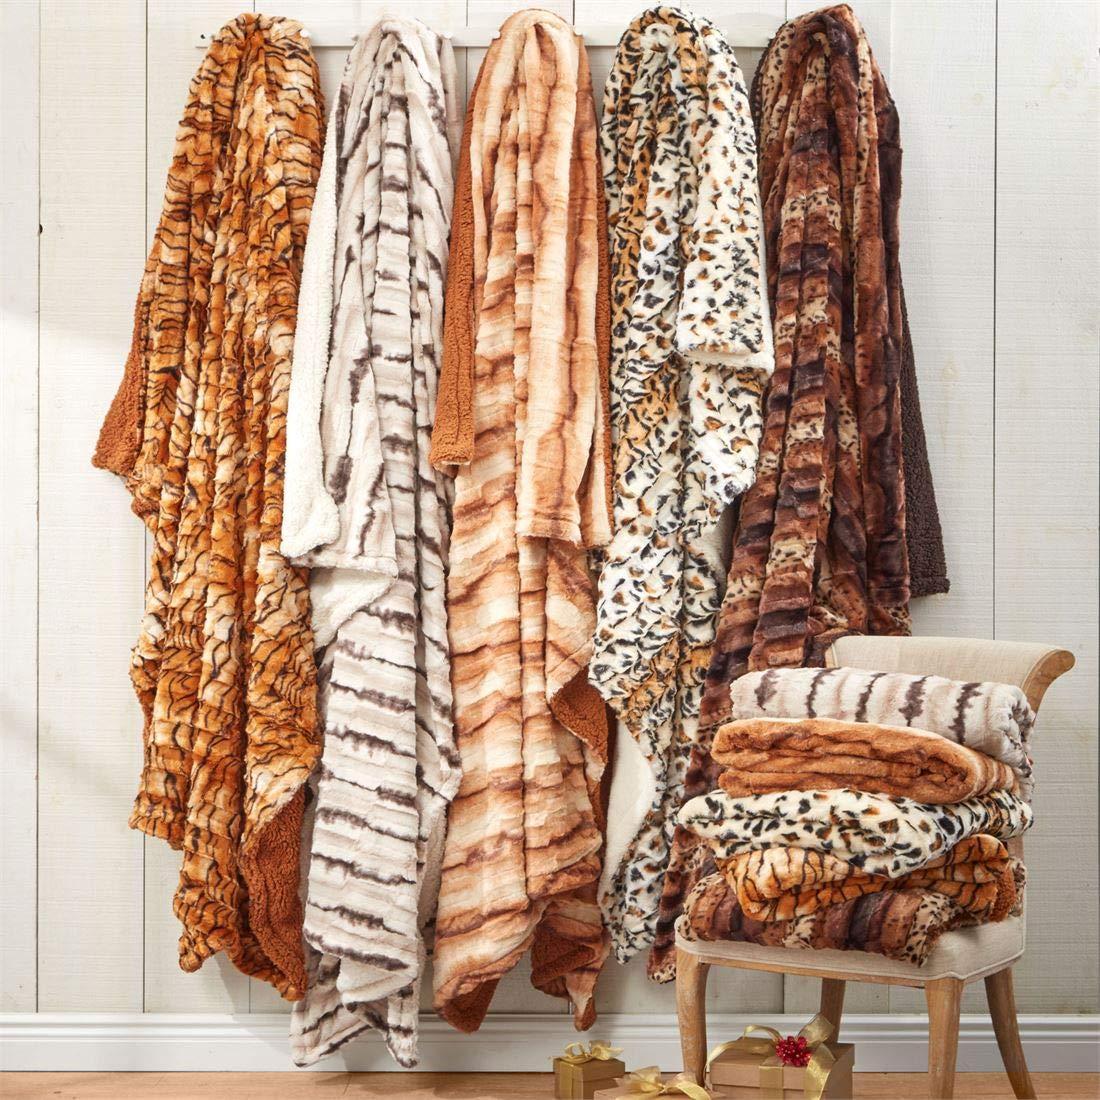 BrylaneHome Faux Fur Animal Print Blanket (Wild Cat Print,Full/Queen)